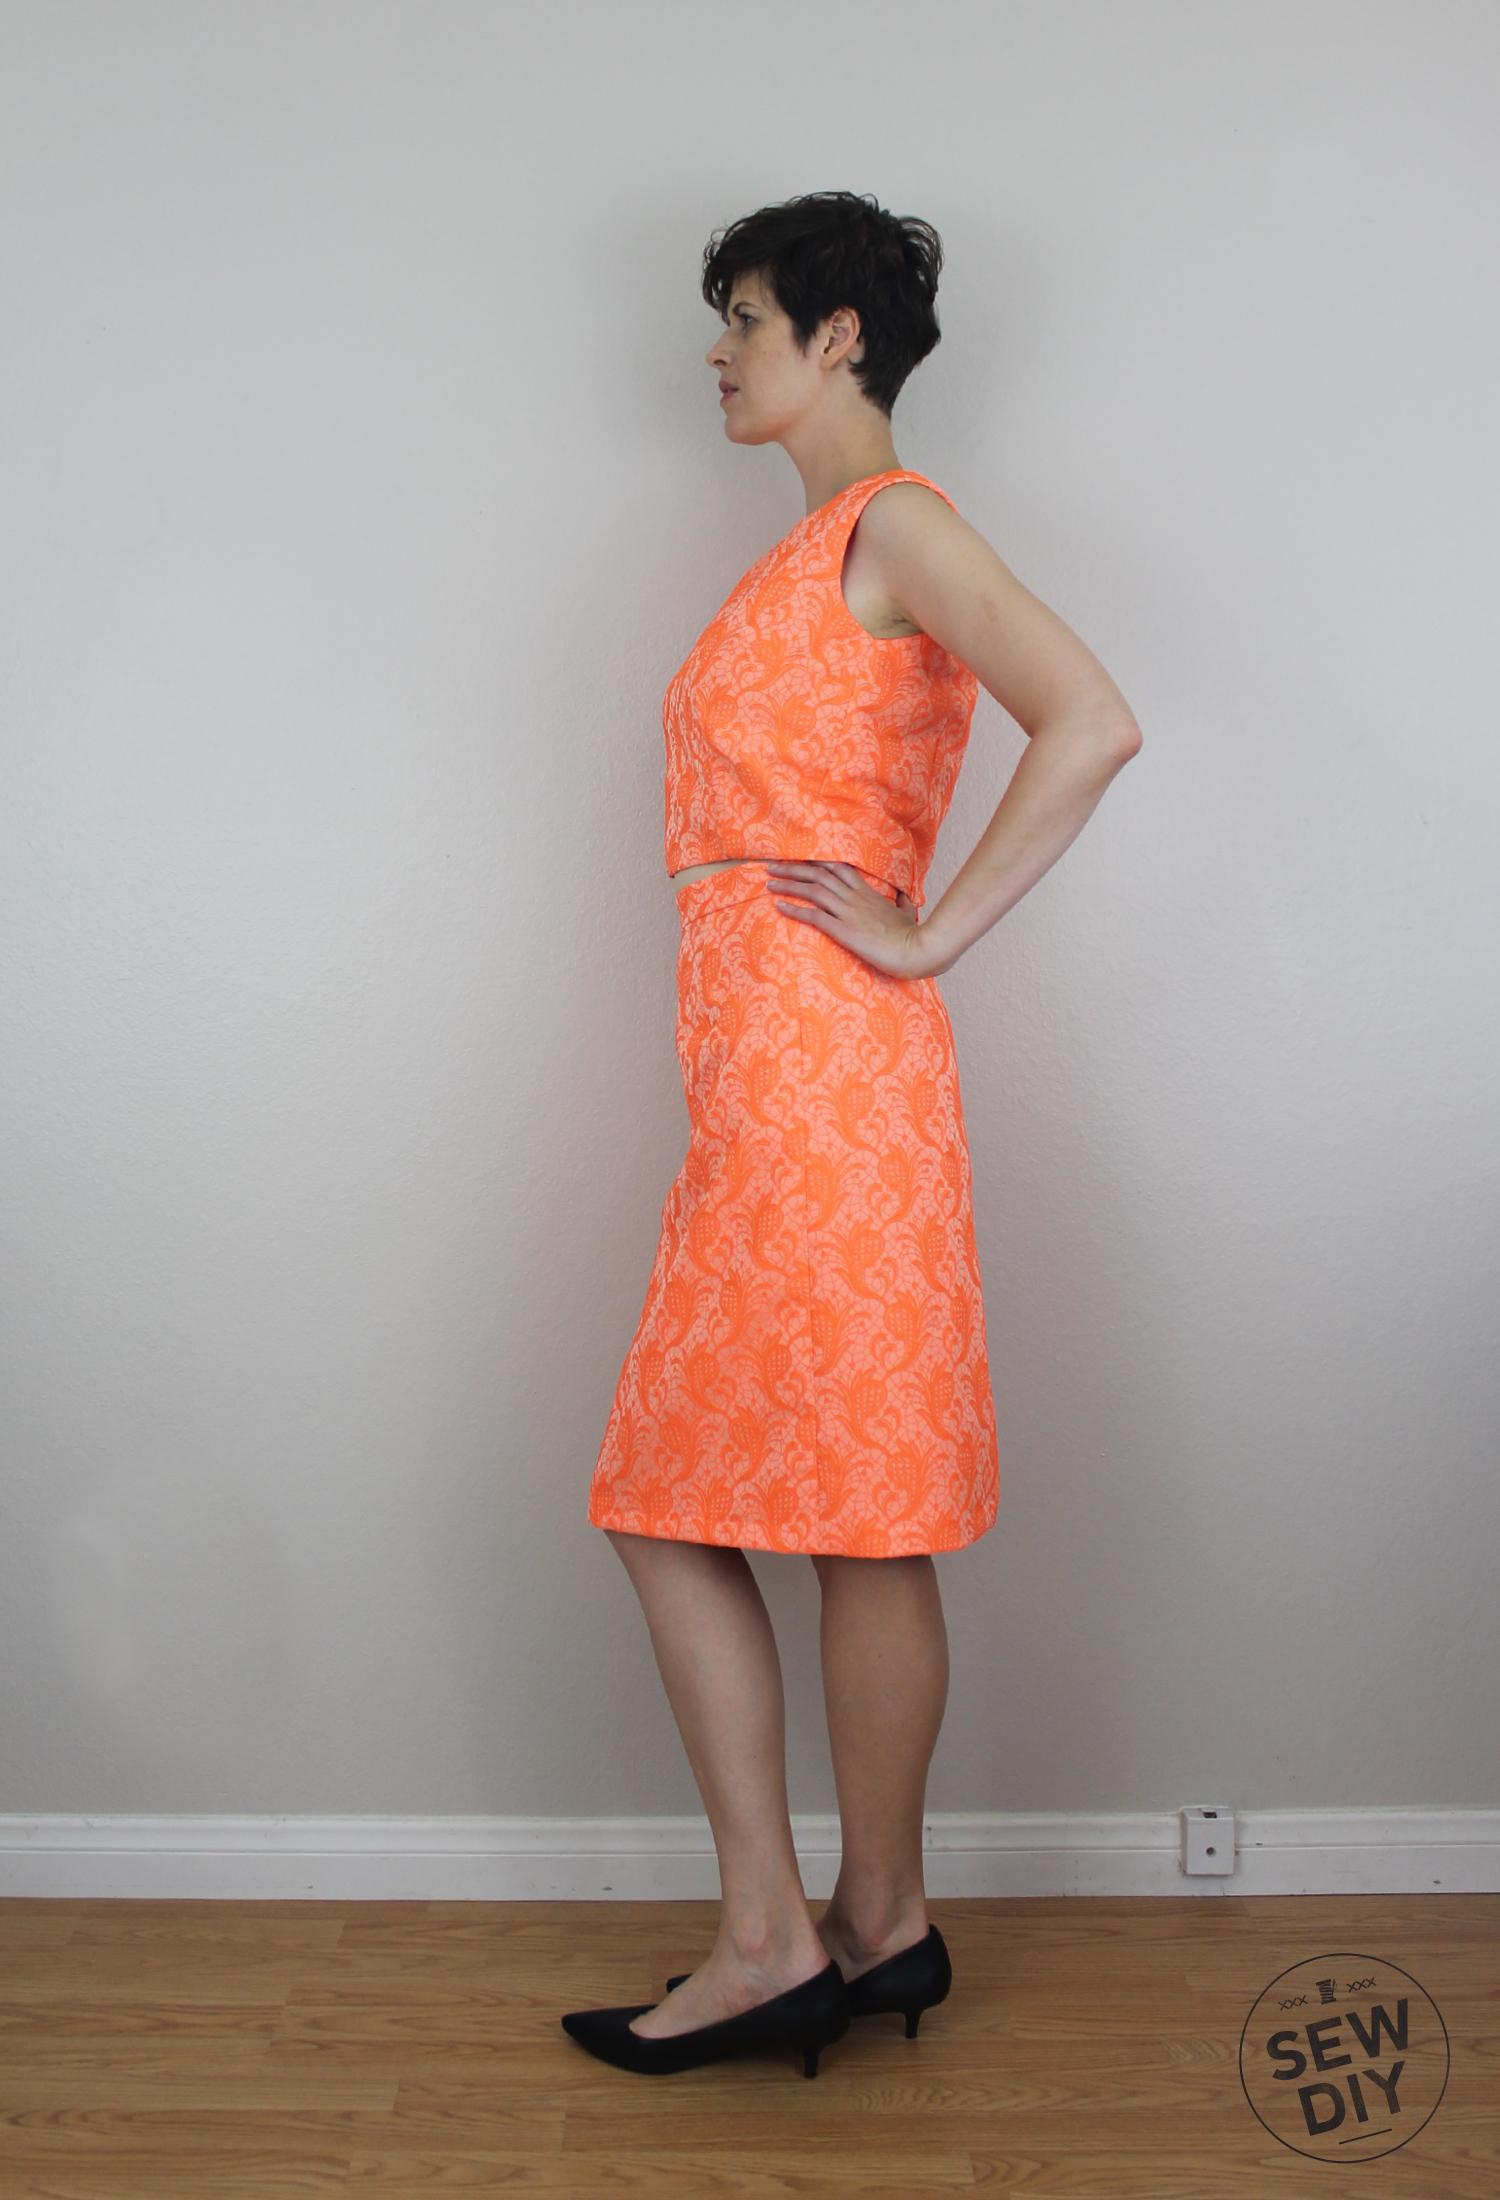 Sew DIY Orange Brocade Two Piece Setacular